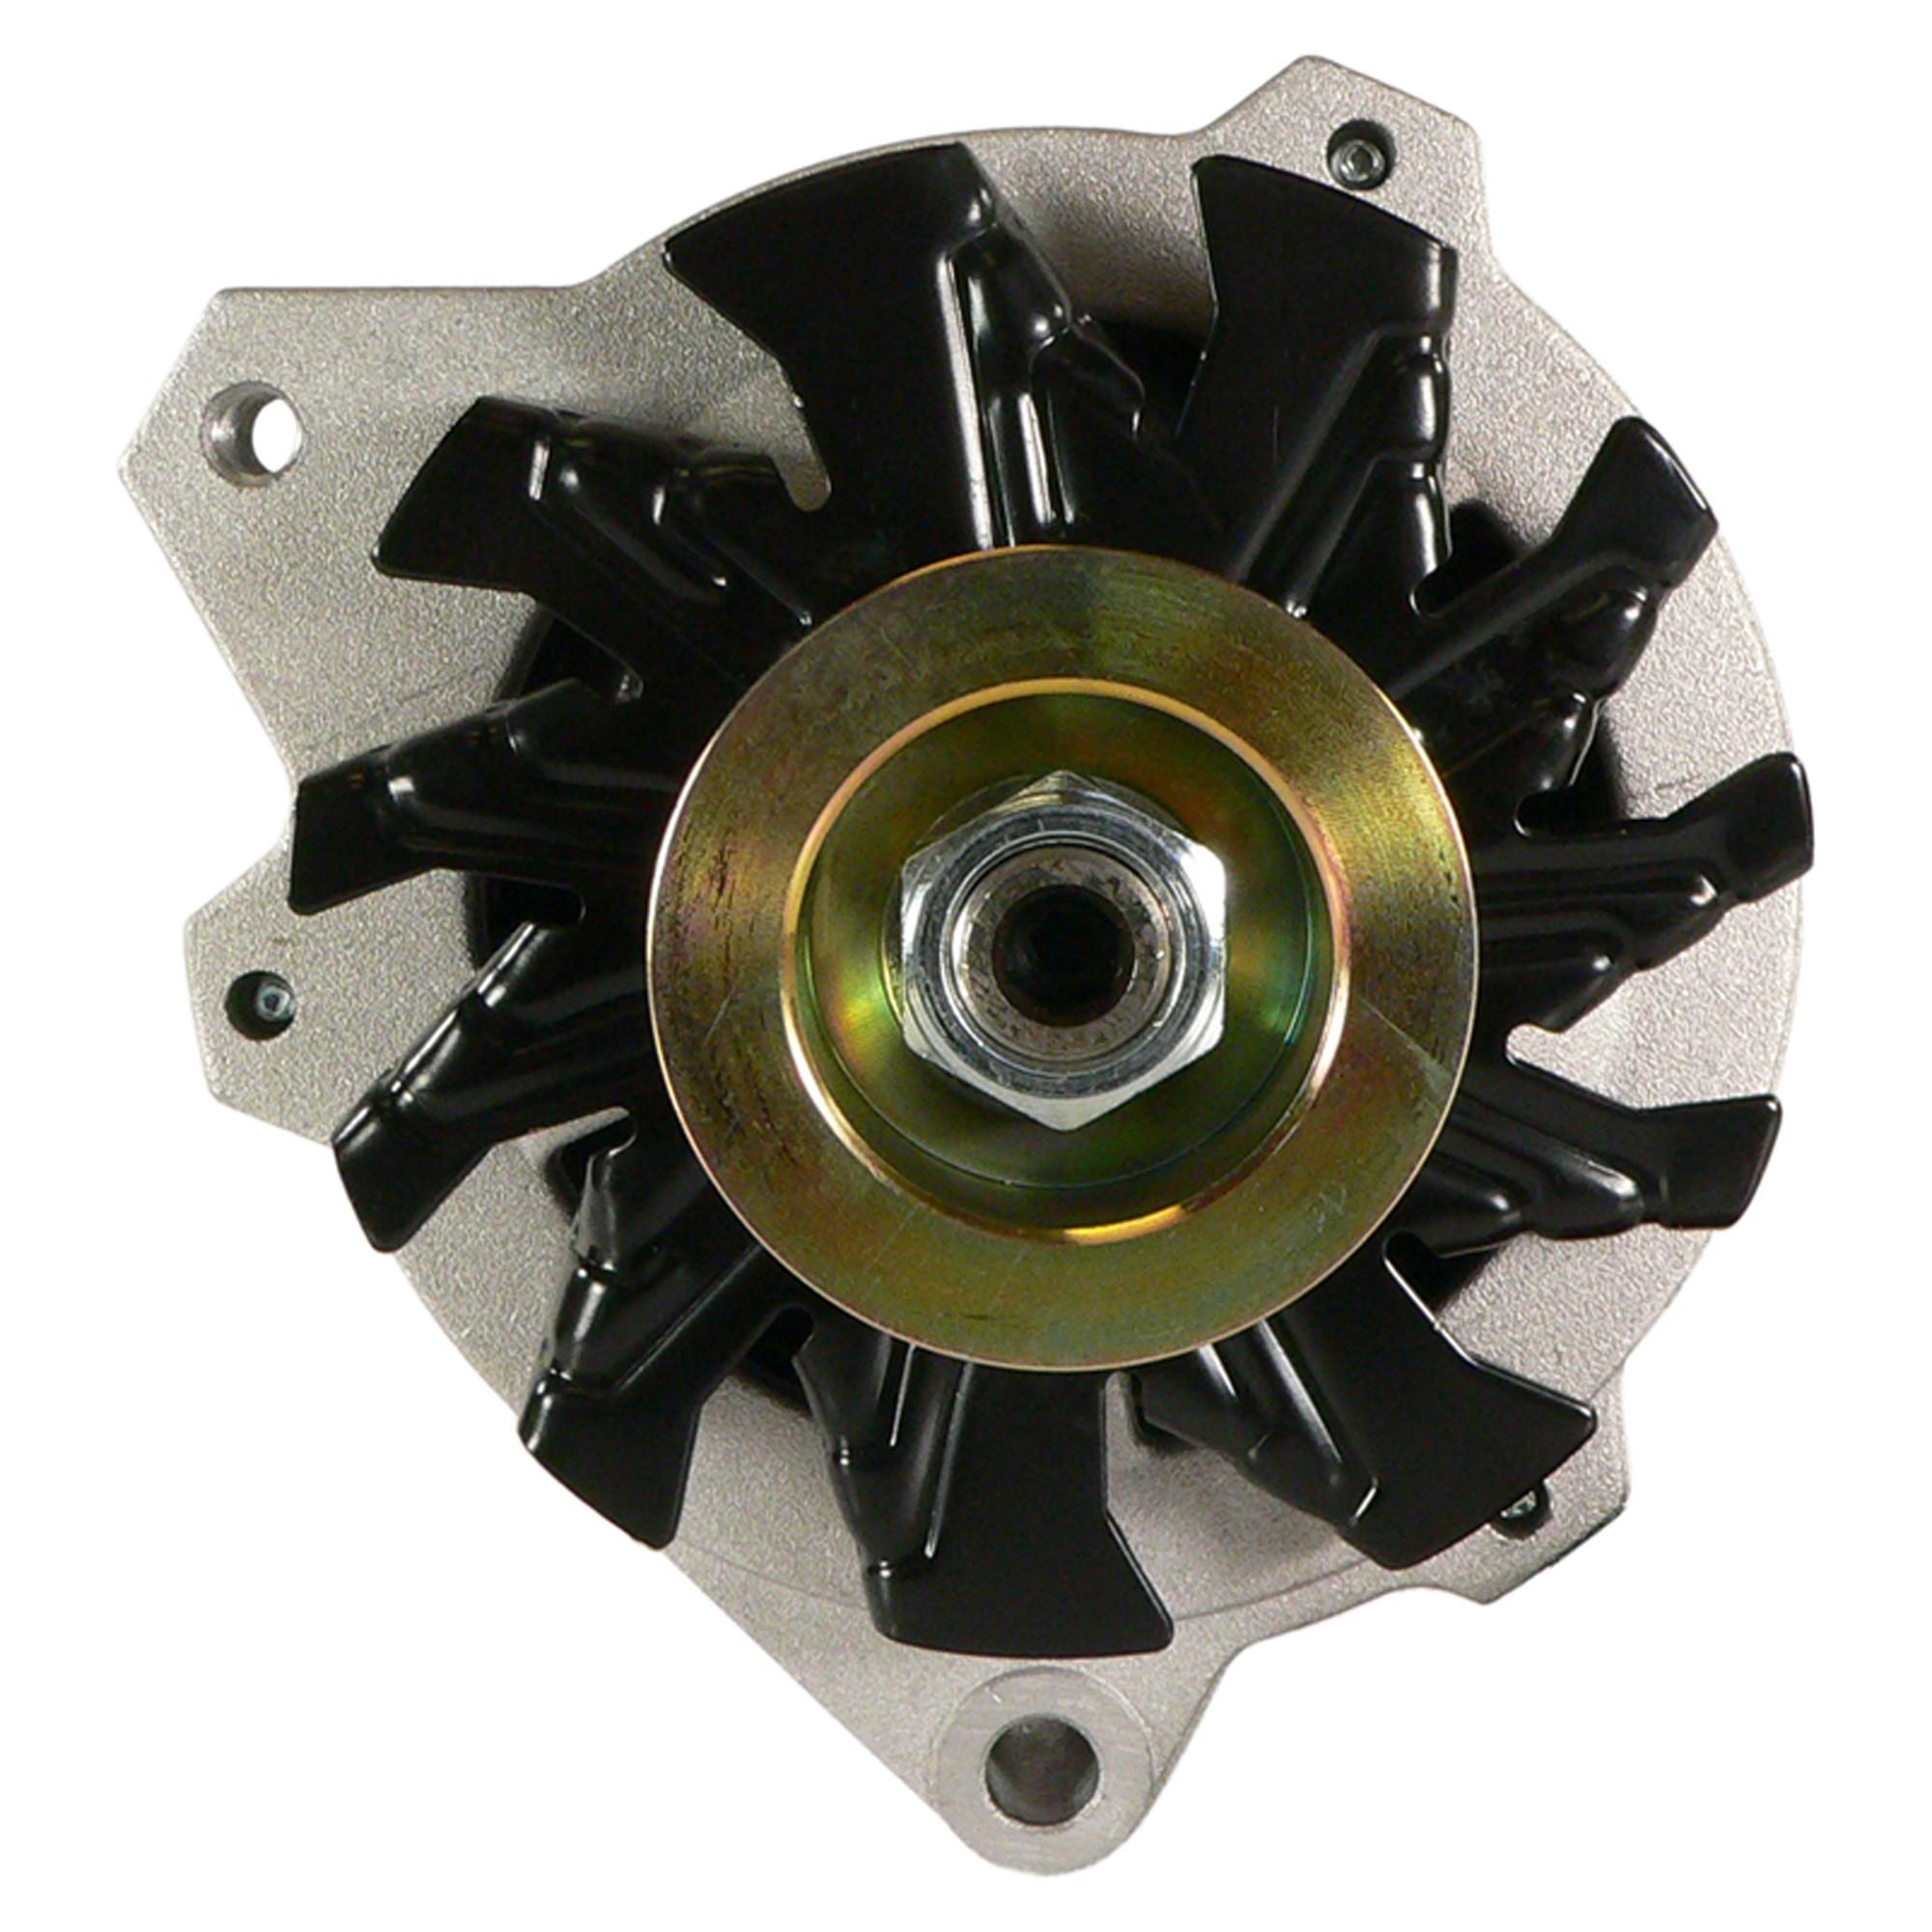 New Alternator For Chevy Astro /& GMC Safari V6 4.3 2001 2002 2003 2004